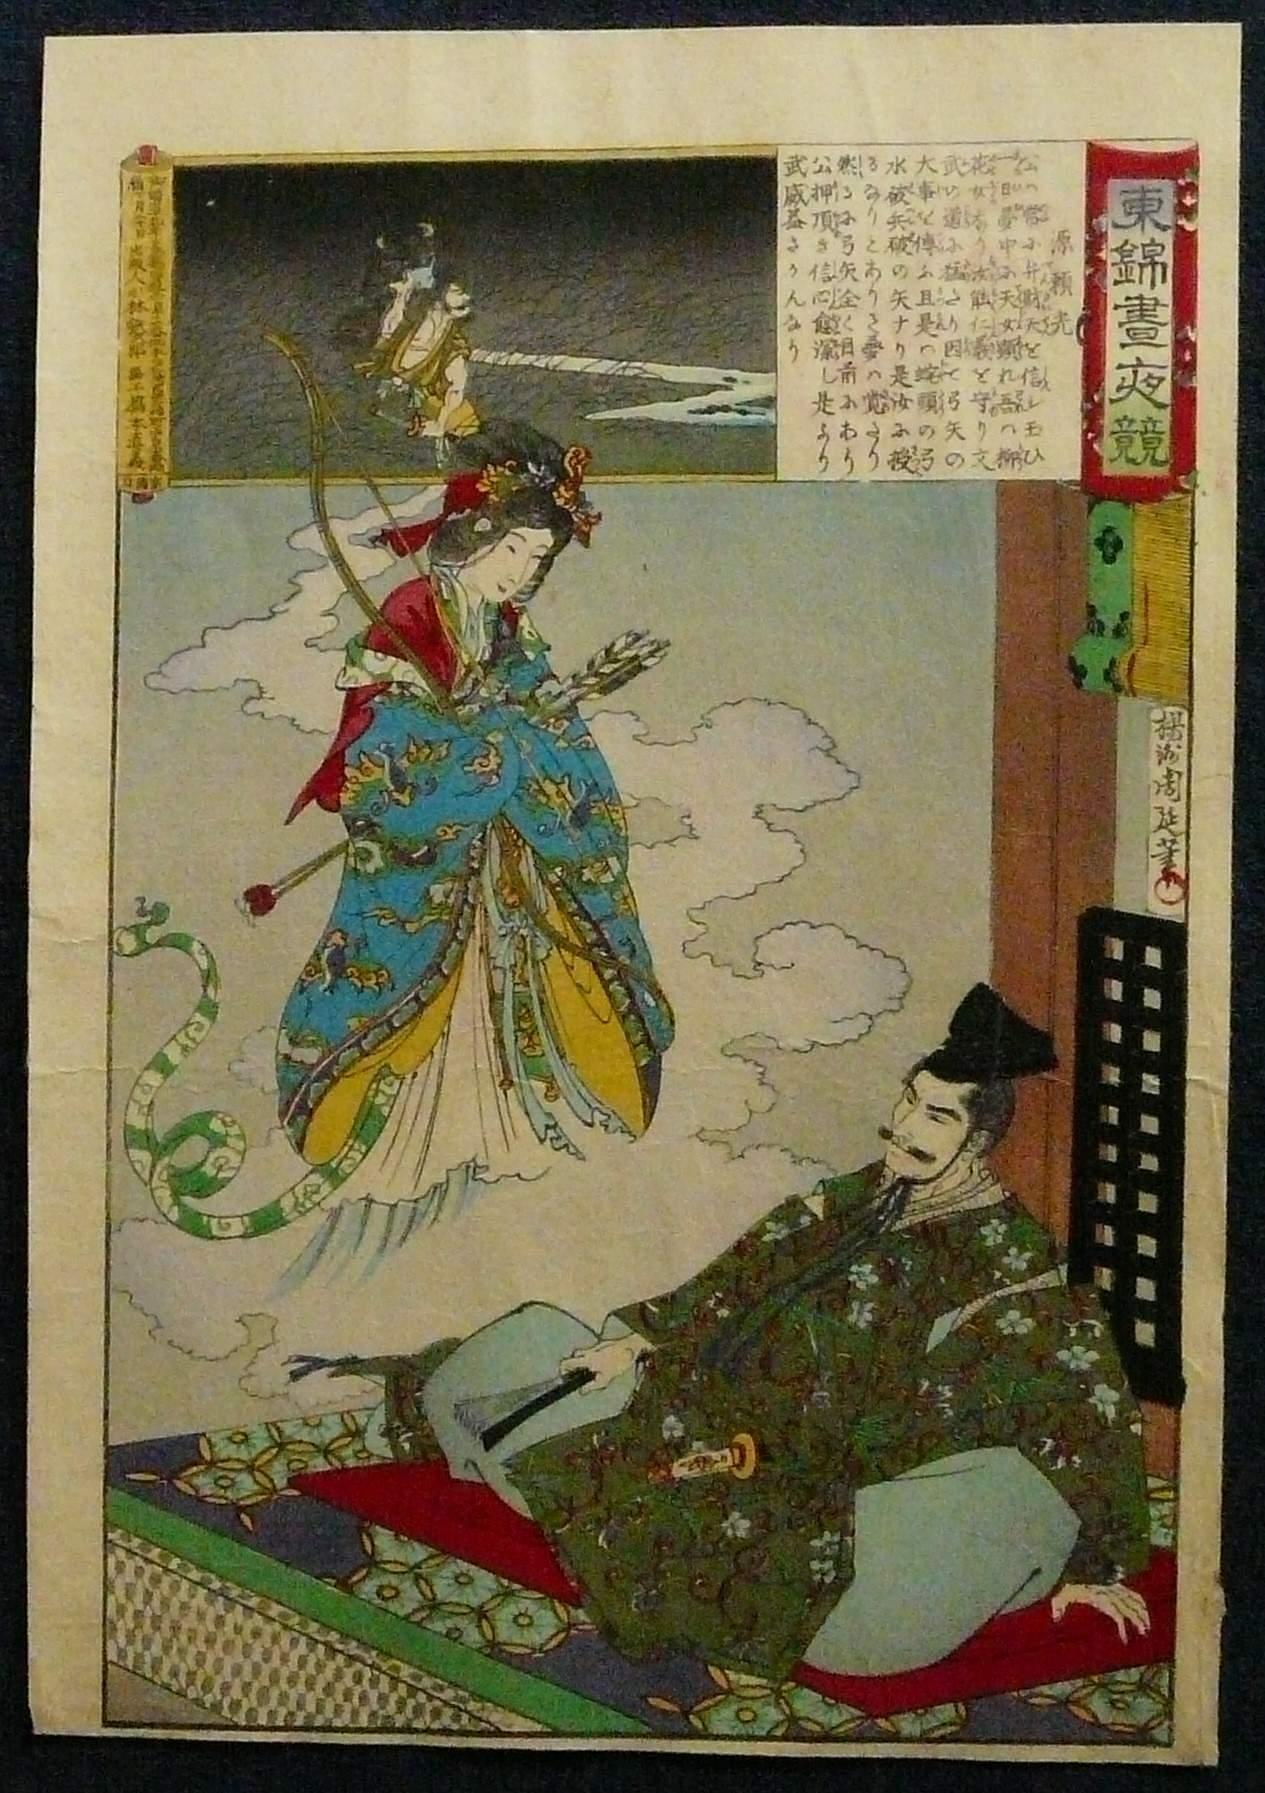 HASHIMOTO CHIKANOBU: #P3381 RAIKO'S VISION OF THE GODDESS BENTON (1886)